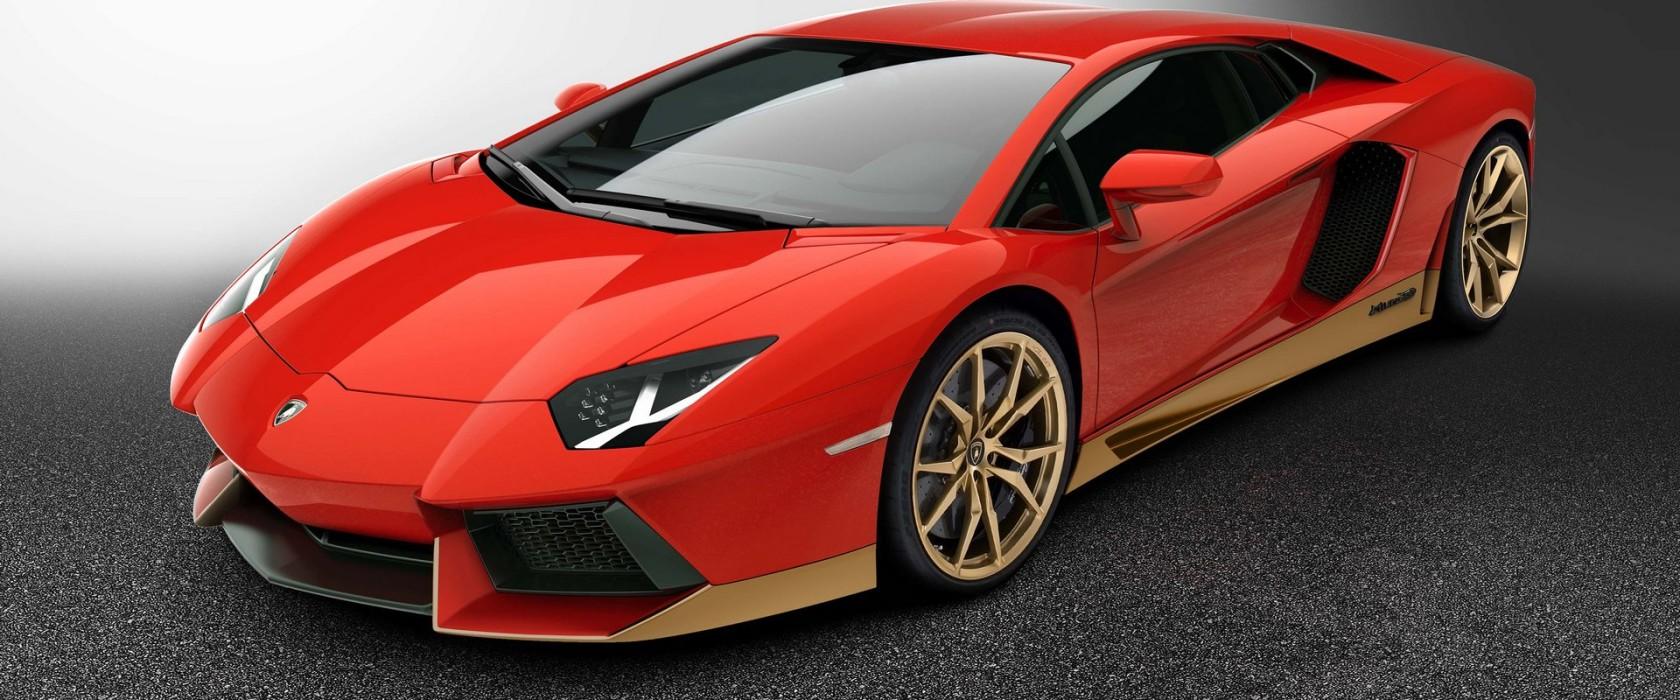 LamborghiniAventadorMiuraHomage-apertura